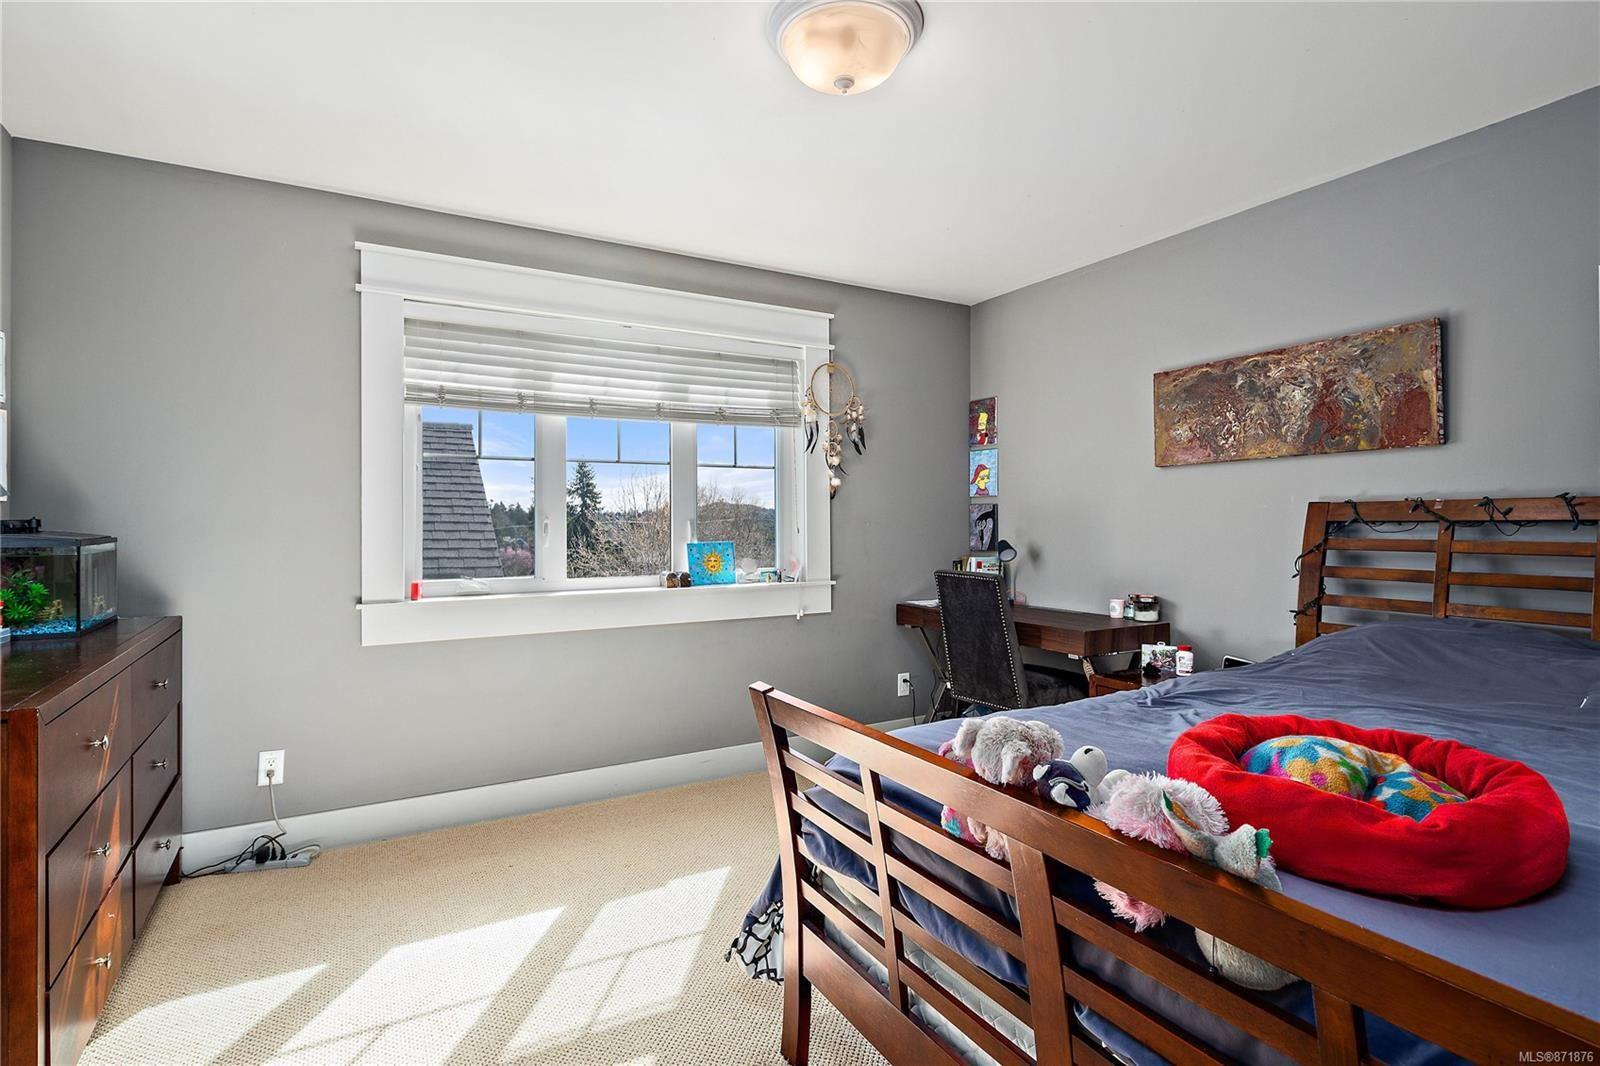 Photo 32: Photos: 4420 Wilkinson Rd in : SW Royal Oak House for sale (Saanich West)  : MLS®# 871876